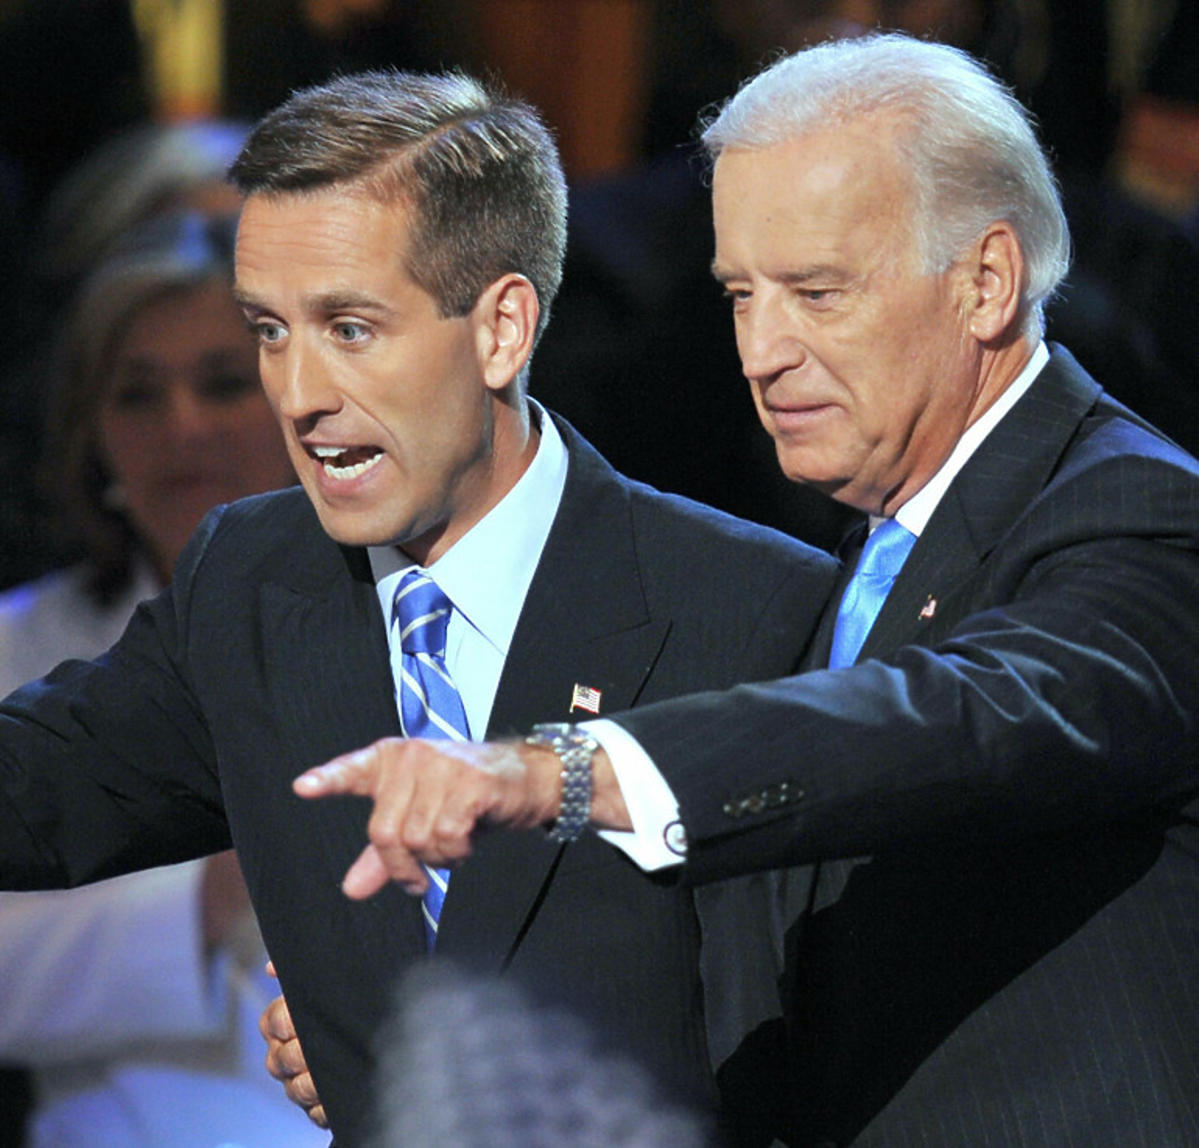 Joe Biden z synem, Beau